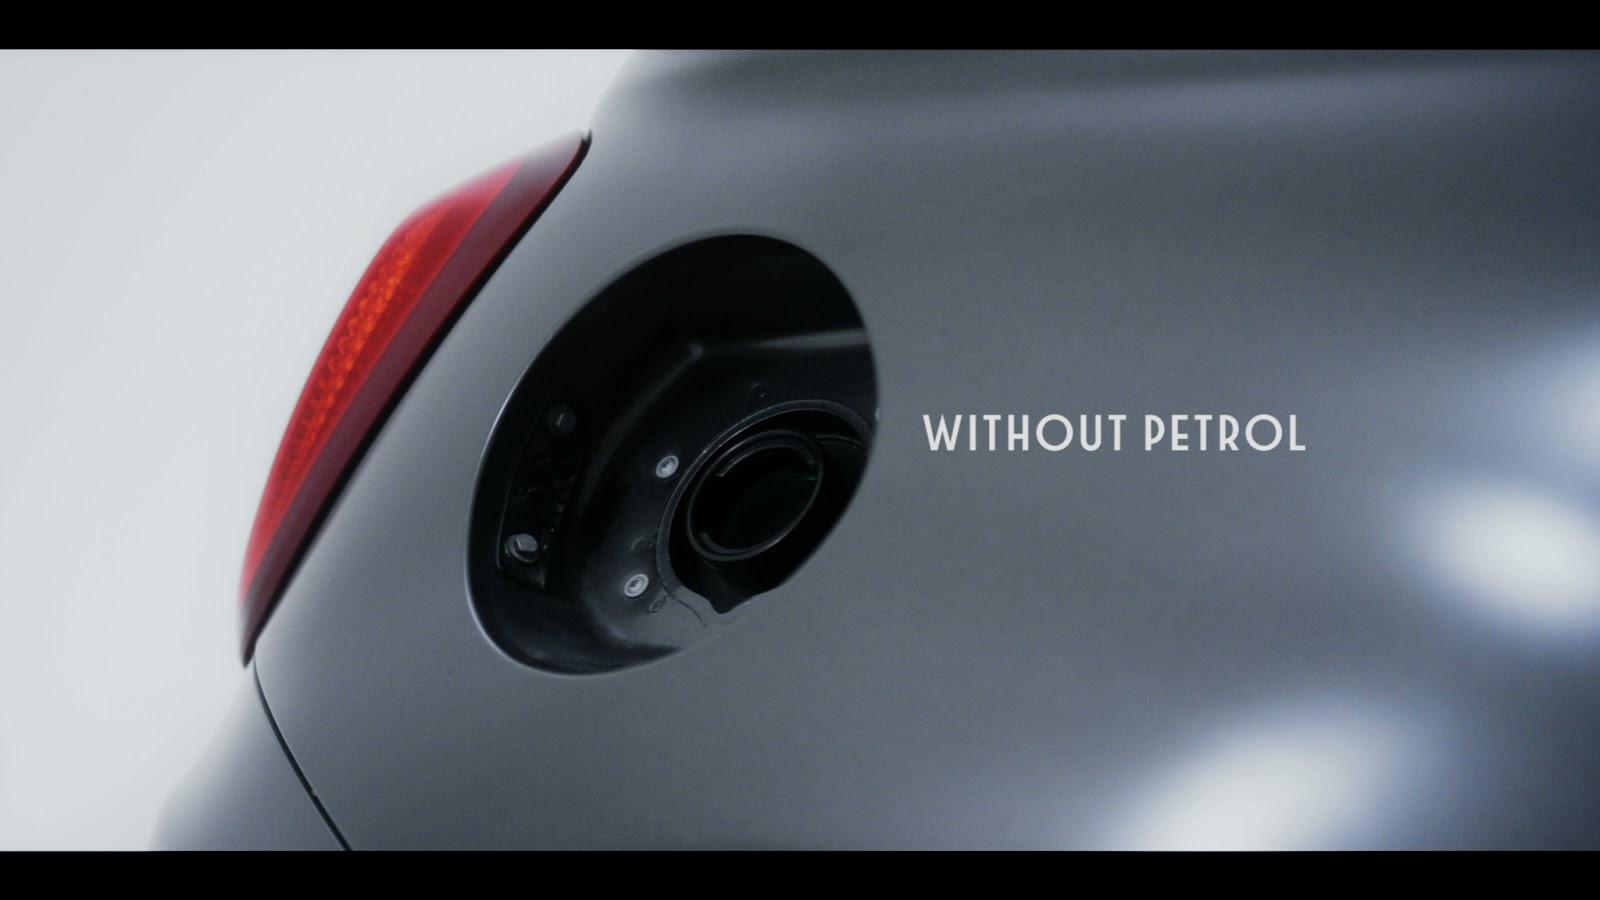 170307 Fiat PETROL ENG Χωρίς τις γυναικείες εφευρέσεις, τα αυτοκίνητα θα ηταν φτωχότερα Fiat, Fiat 500, videos, woman